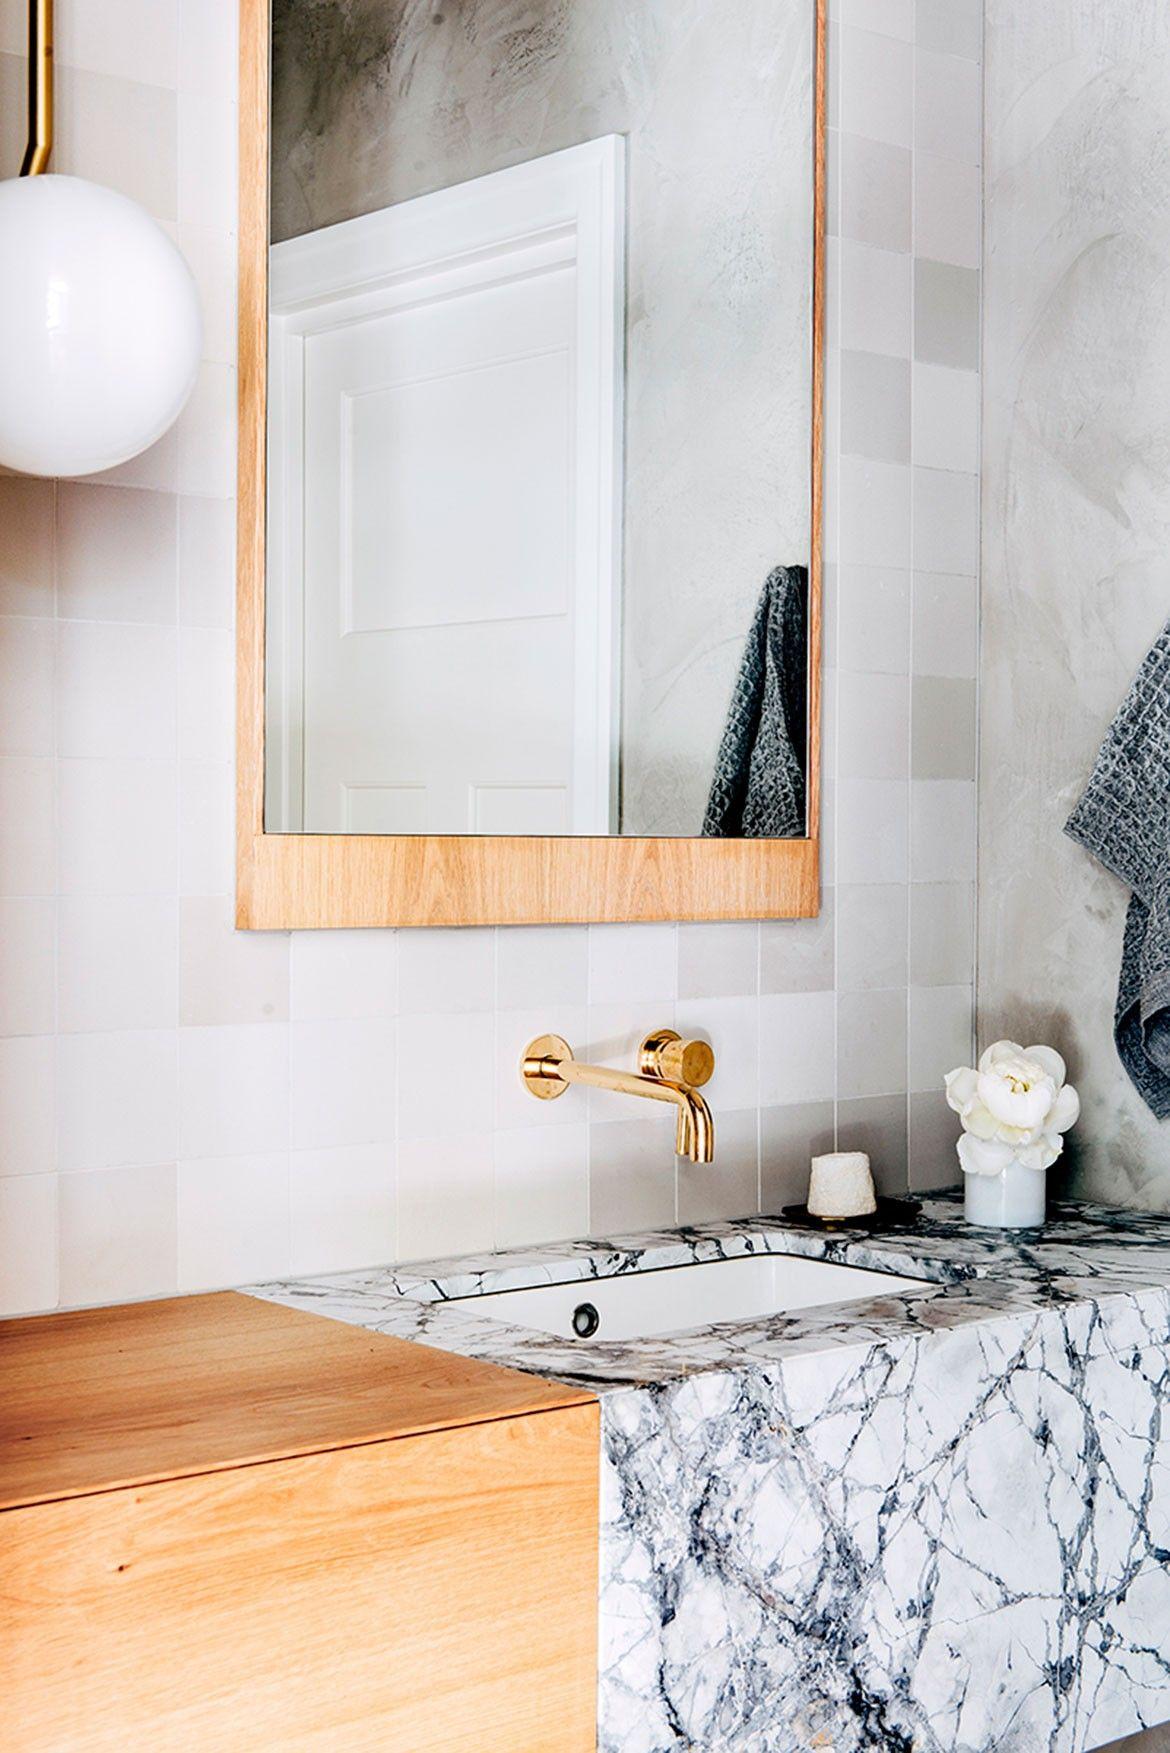 Stables House / Robson Rak | BATHROOM | Pinterest | House, Interiors ...